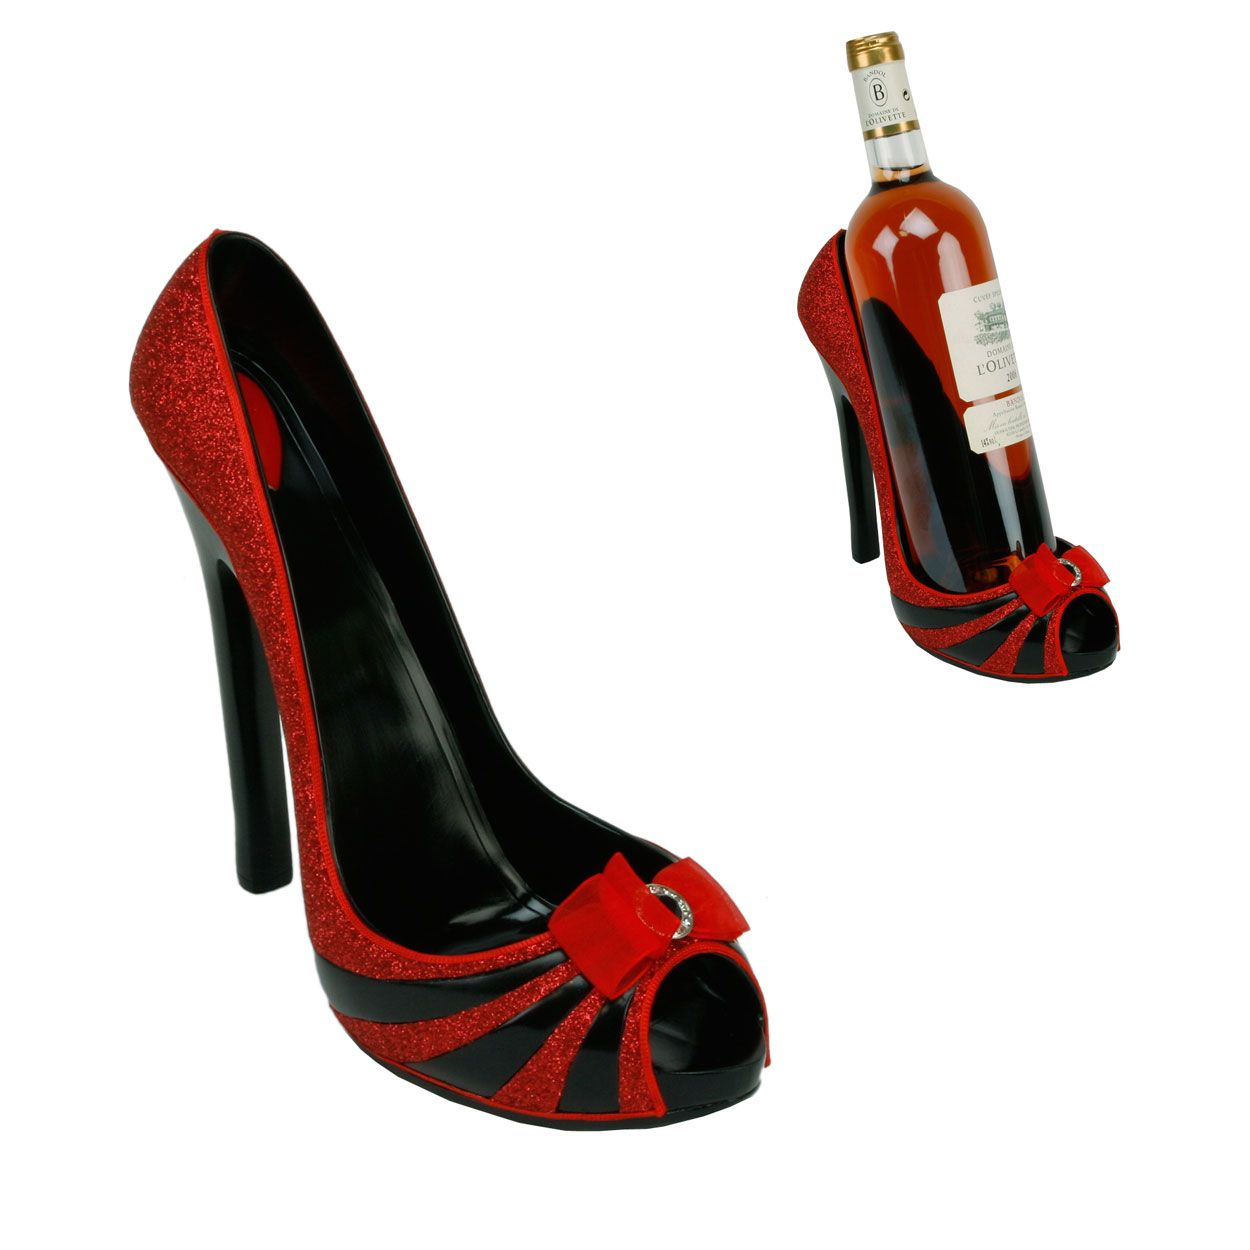 Shoe Wine Bottle Holder Holders Shoes